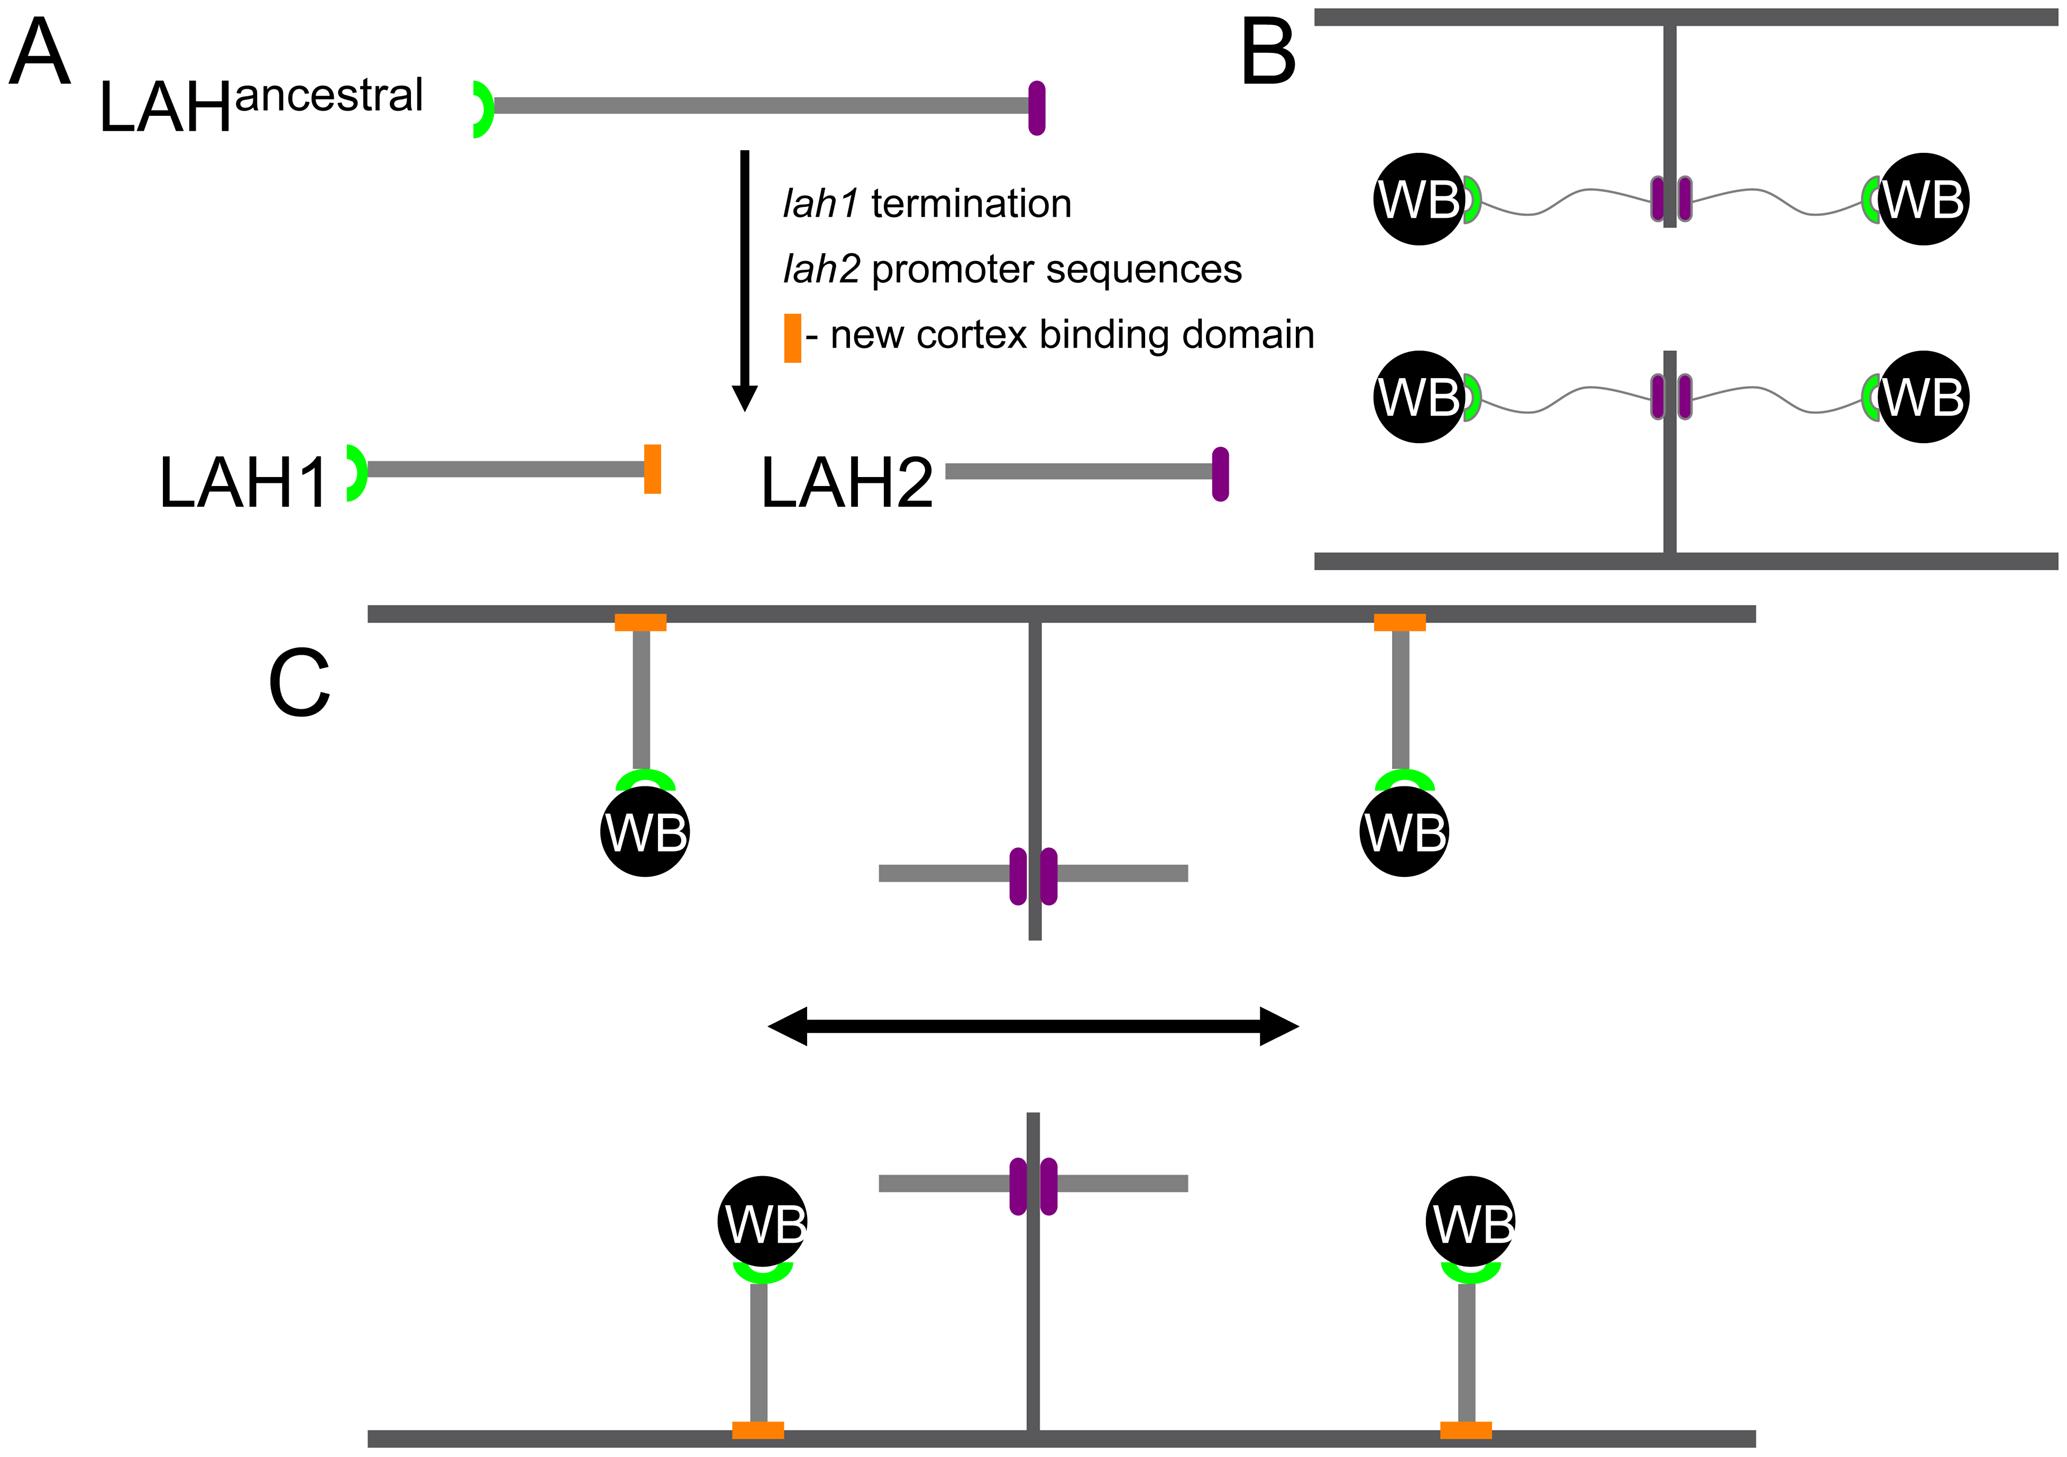 A dispersed septal plug (Woronin body [WB]) may facilitate rapid cytoplasmic streaming and hyphal growth in <i>N. crassa</i>.